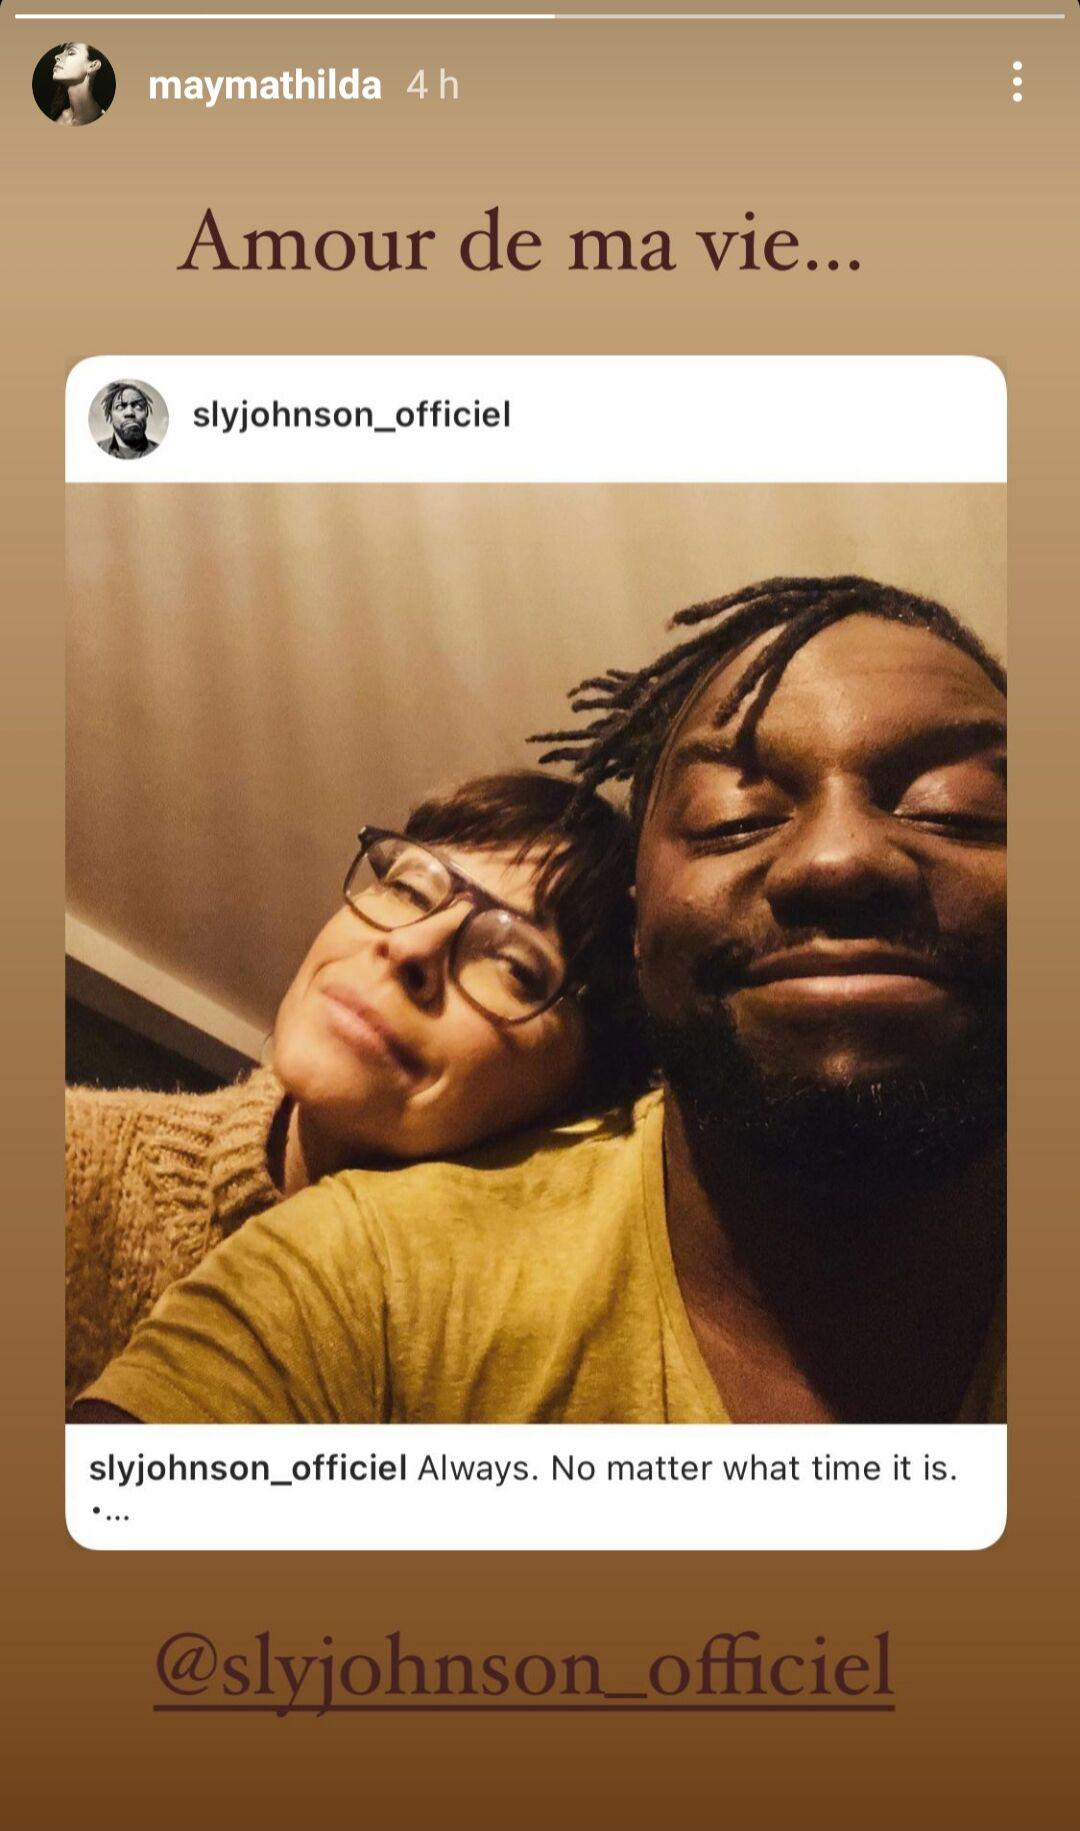 Story Instagram de Mathilda May, ce 13 janvier 2021.